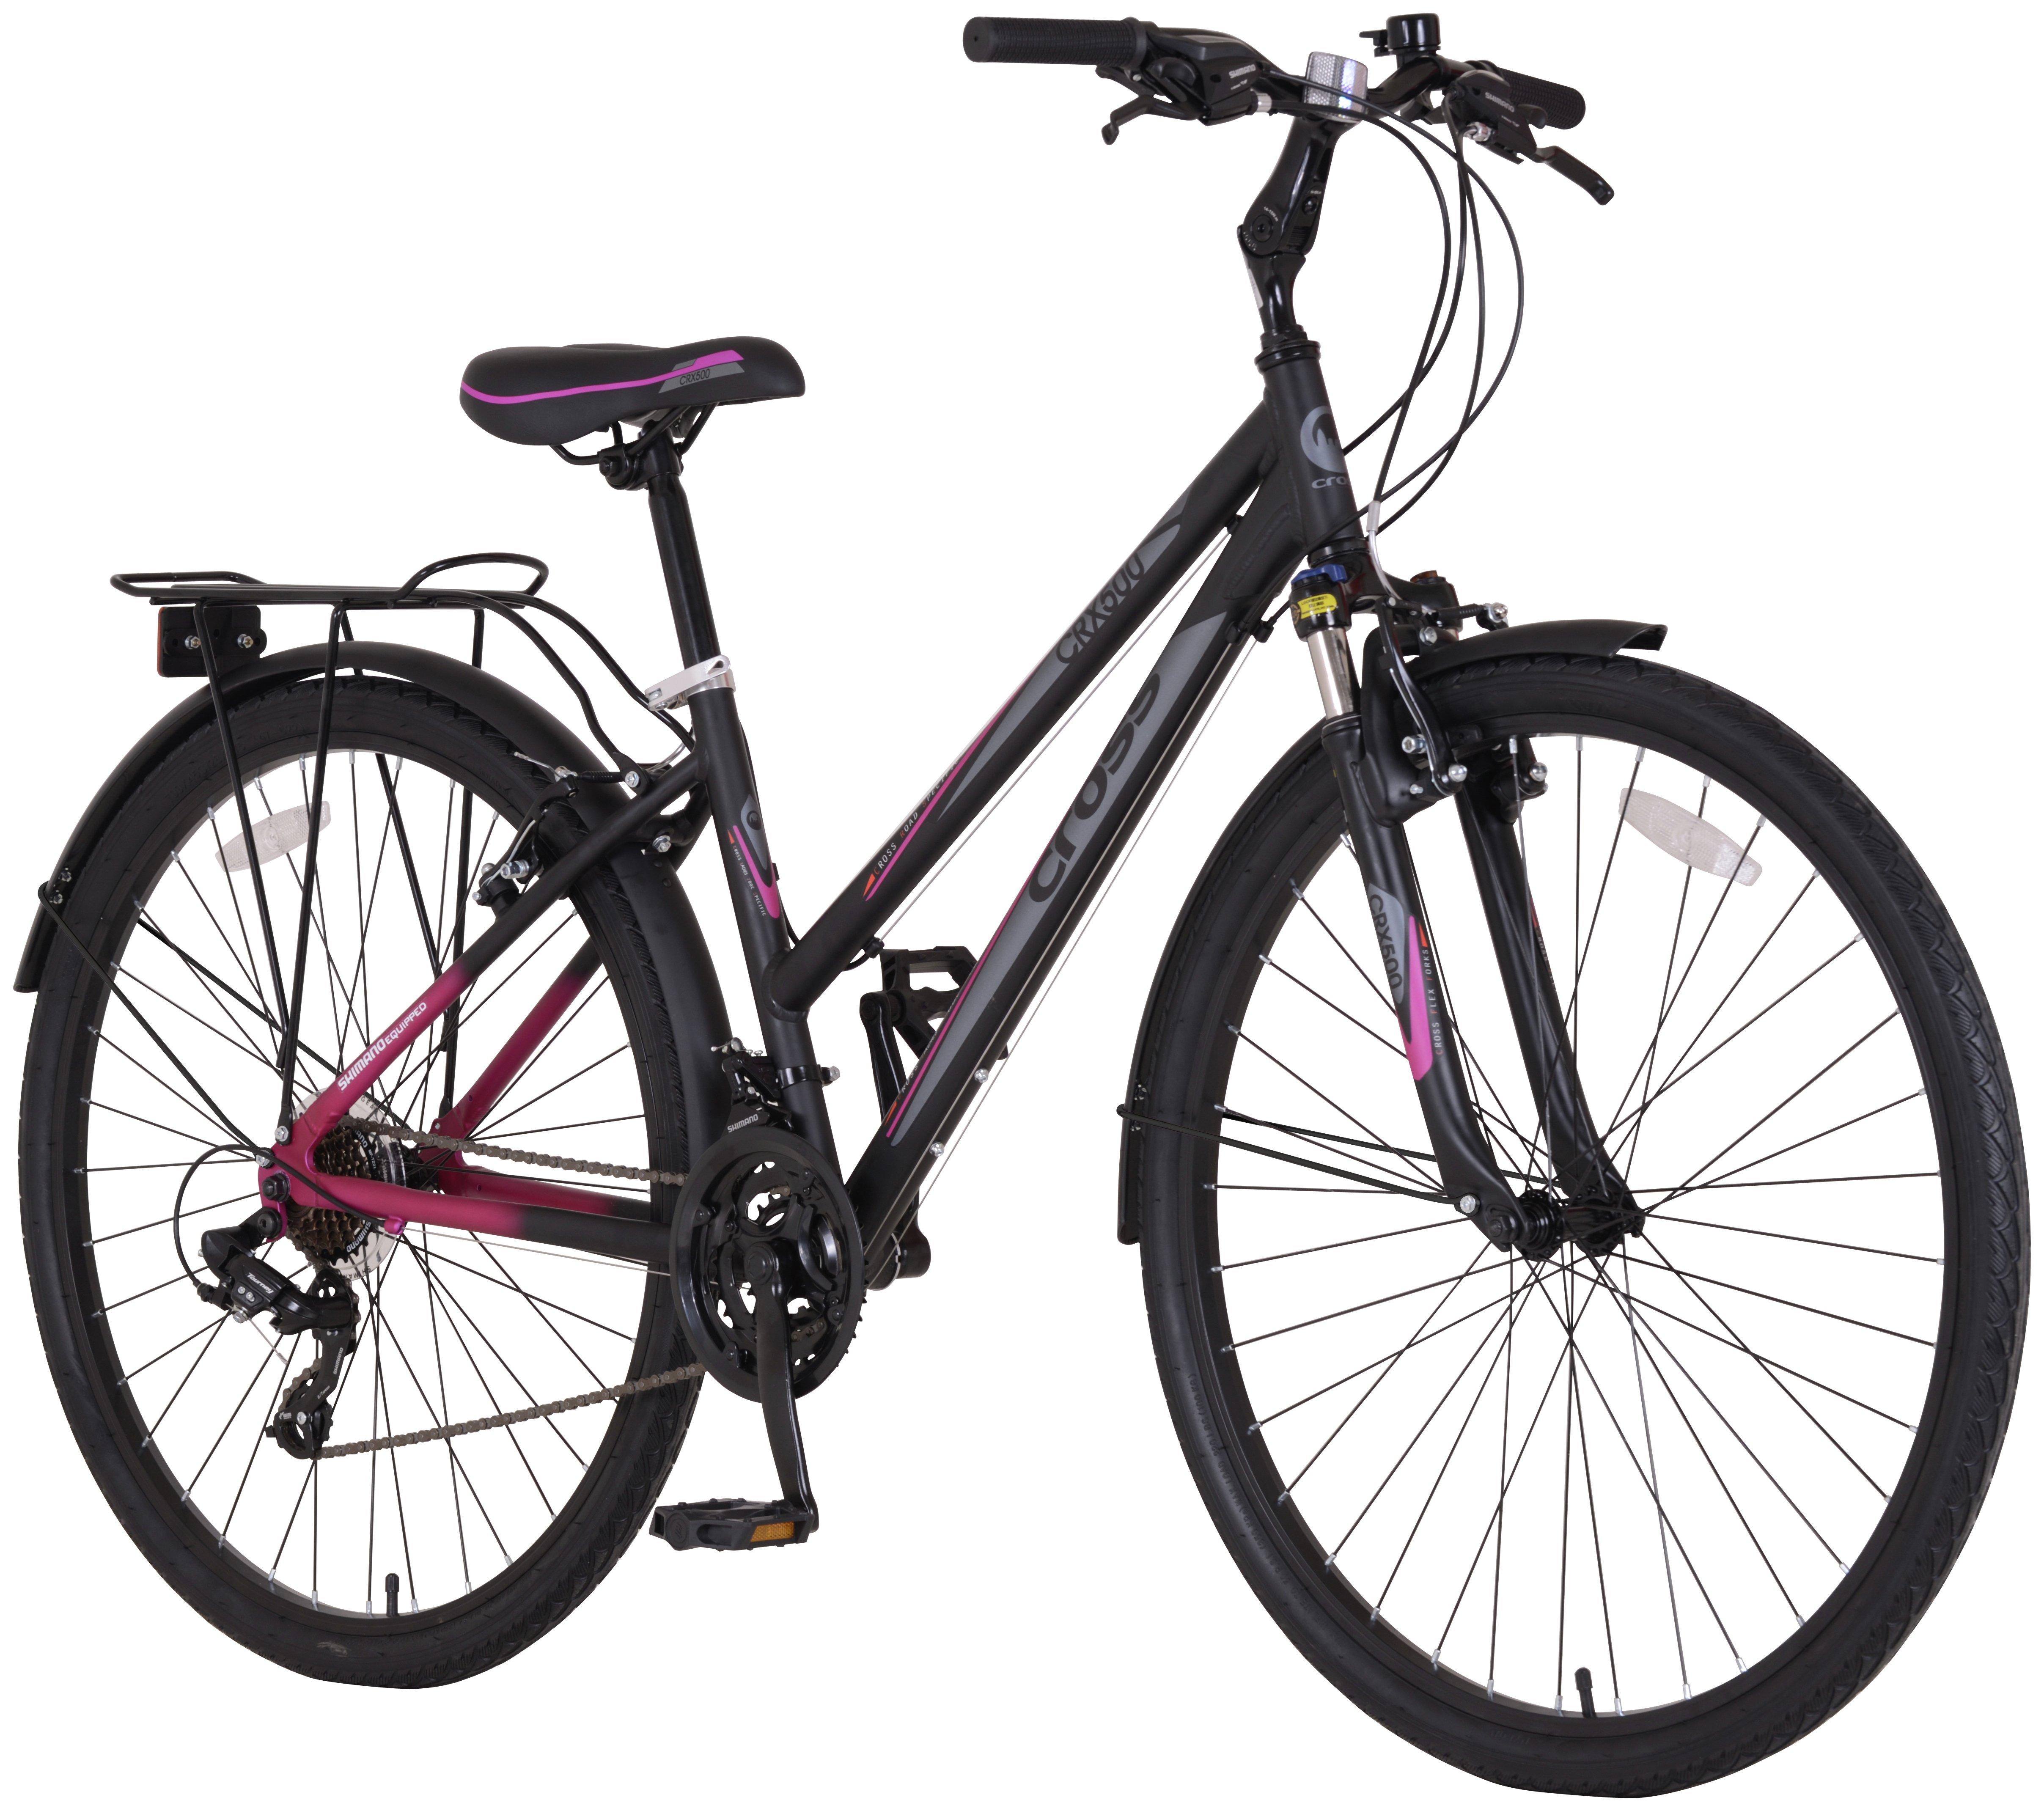 Image of Cross CRX500 700c Hybrid Bike - Womens